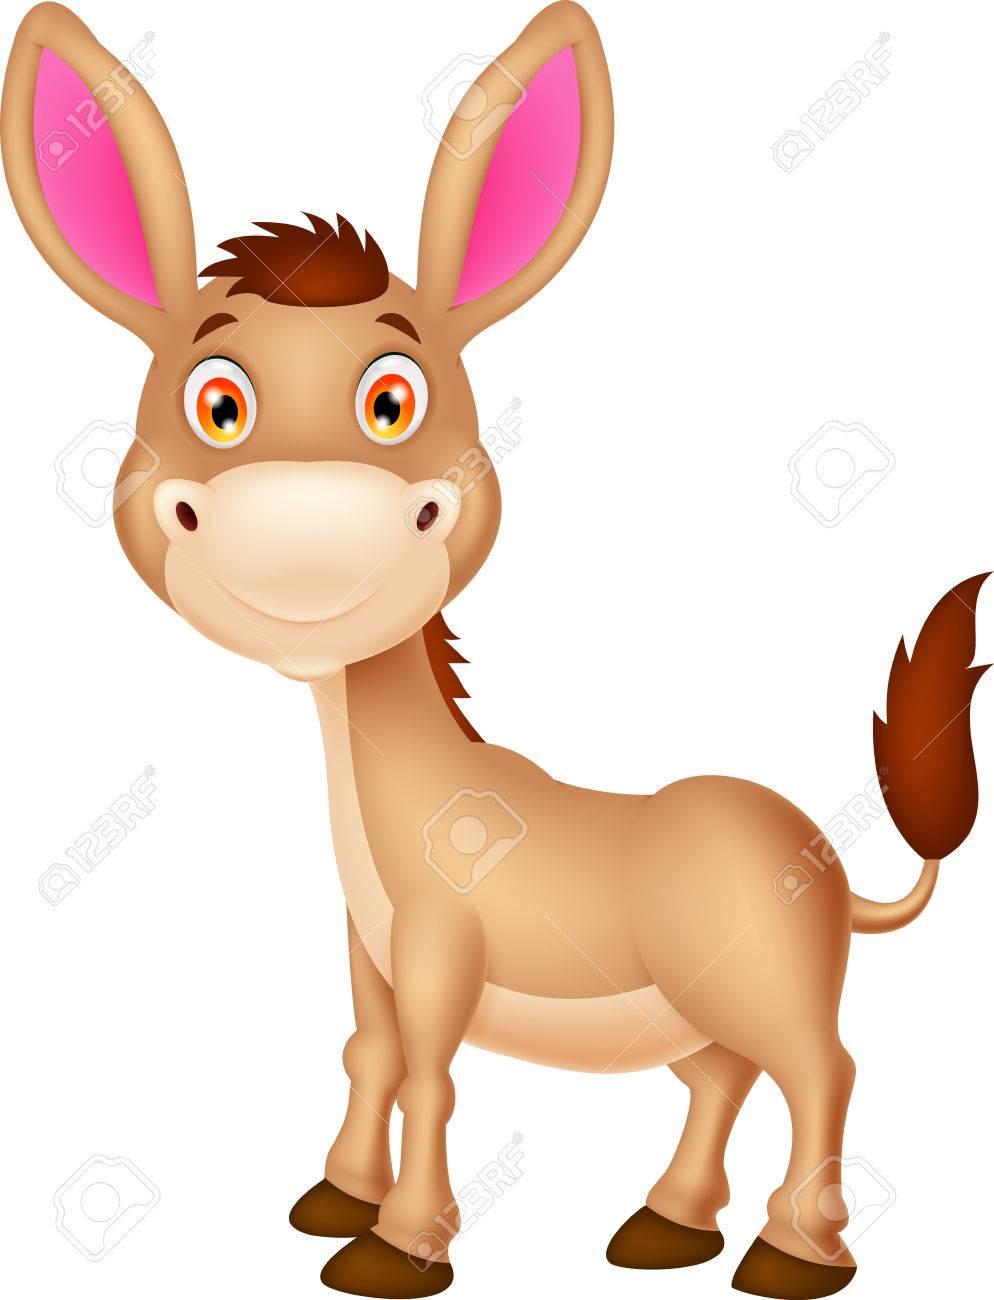 994x1300 Cute Donkey Cartoon Royalty Free Cliparts, Vectors, And Stock